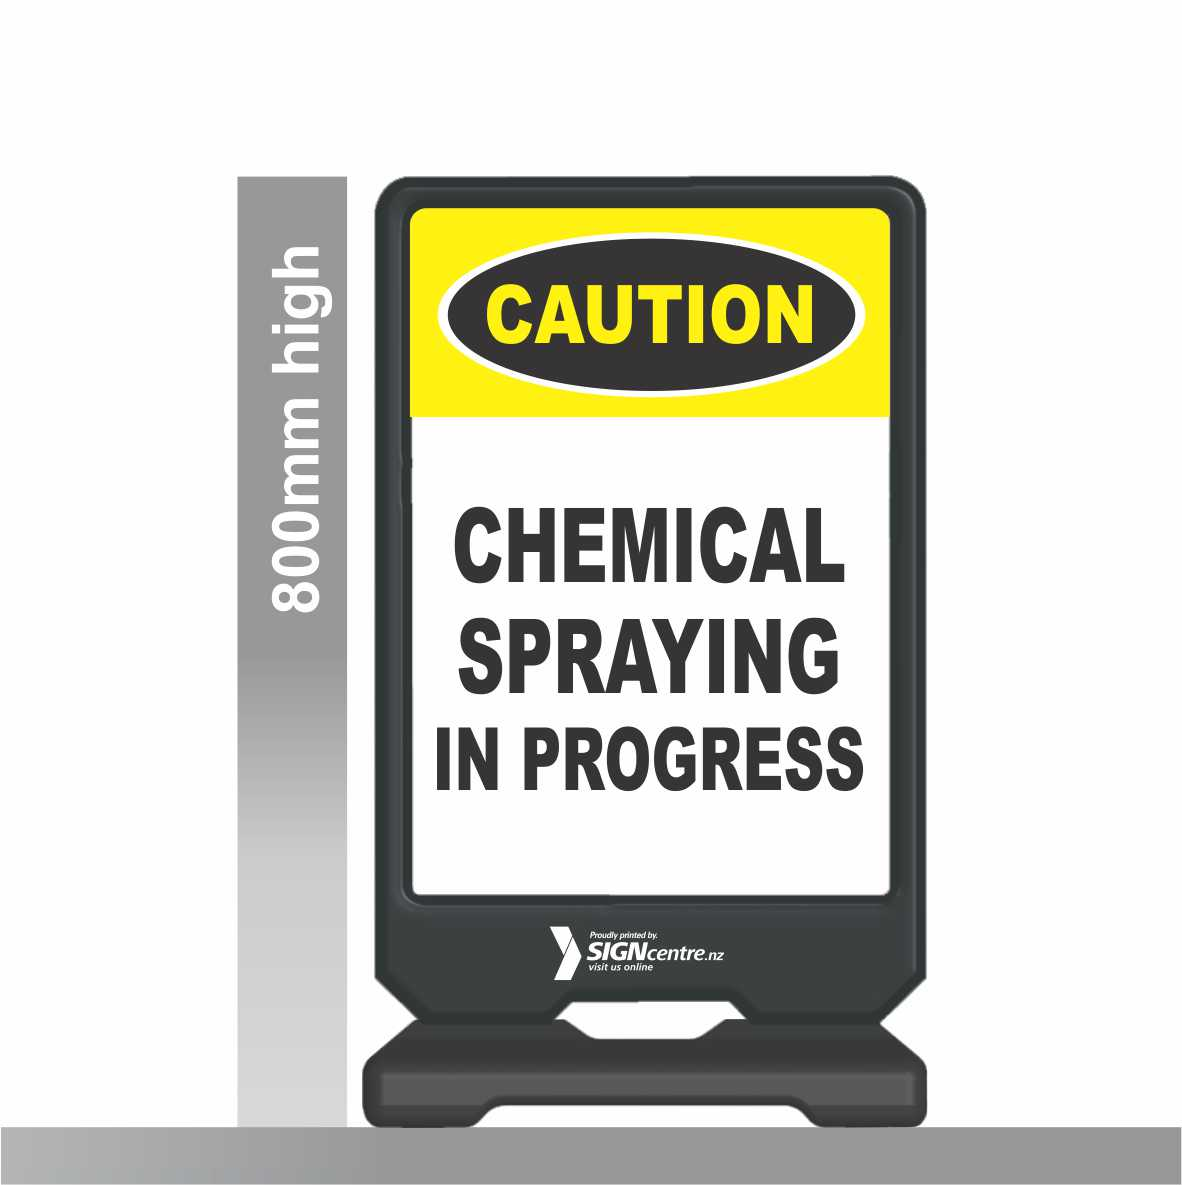 CHEMICAL SPRAY SIGNAGE